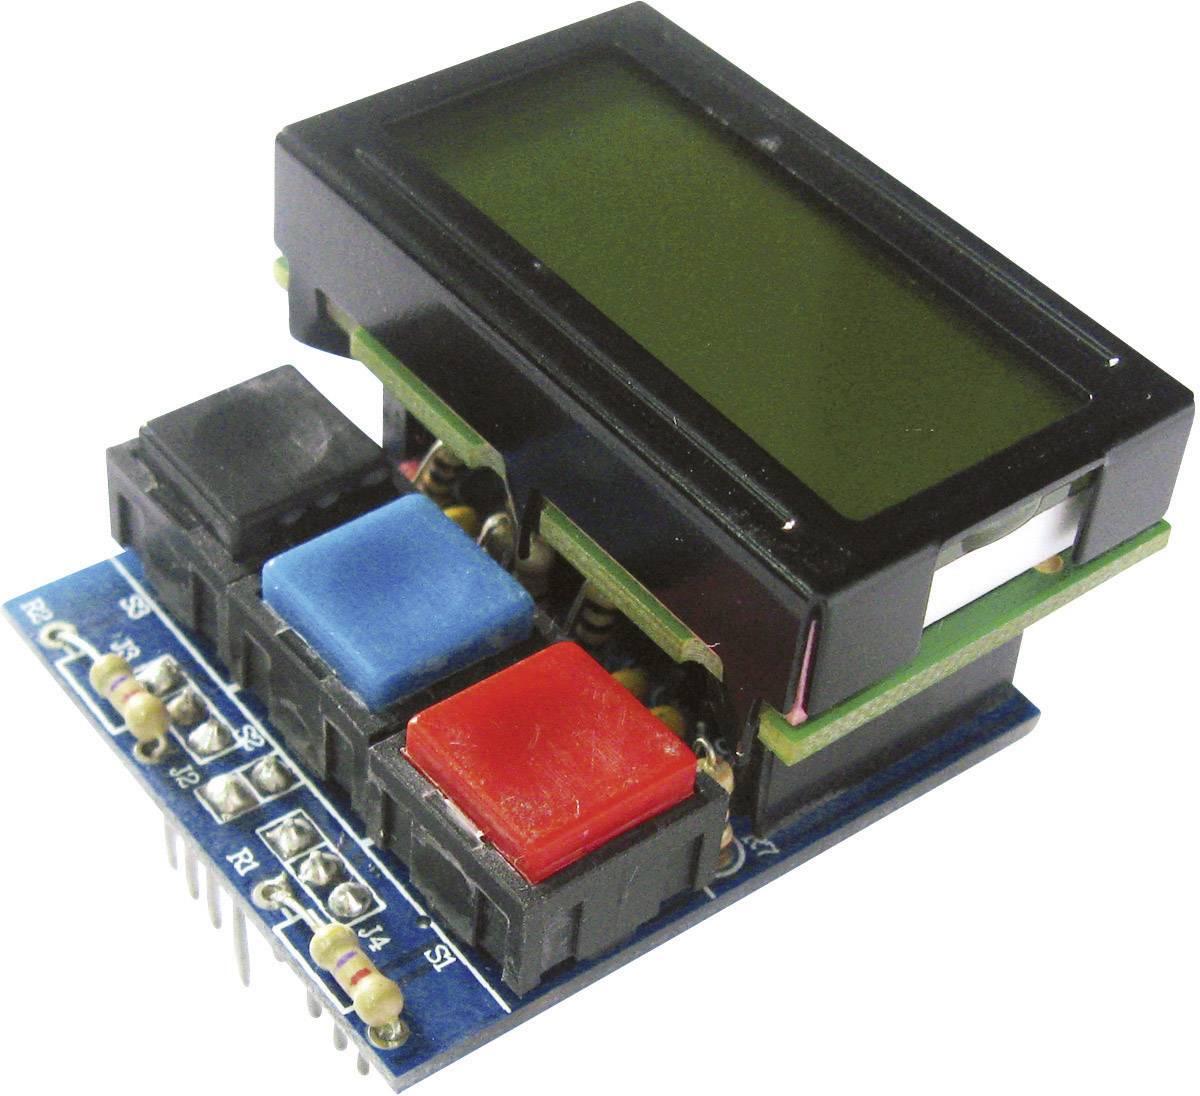 Displej ARX-DSP30 pre robota Arexx Asura ARX-03